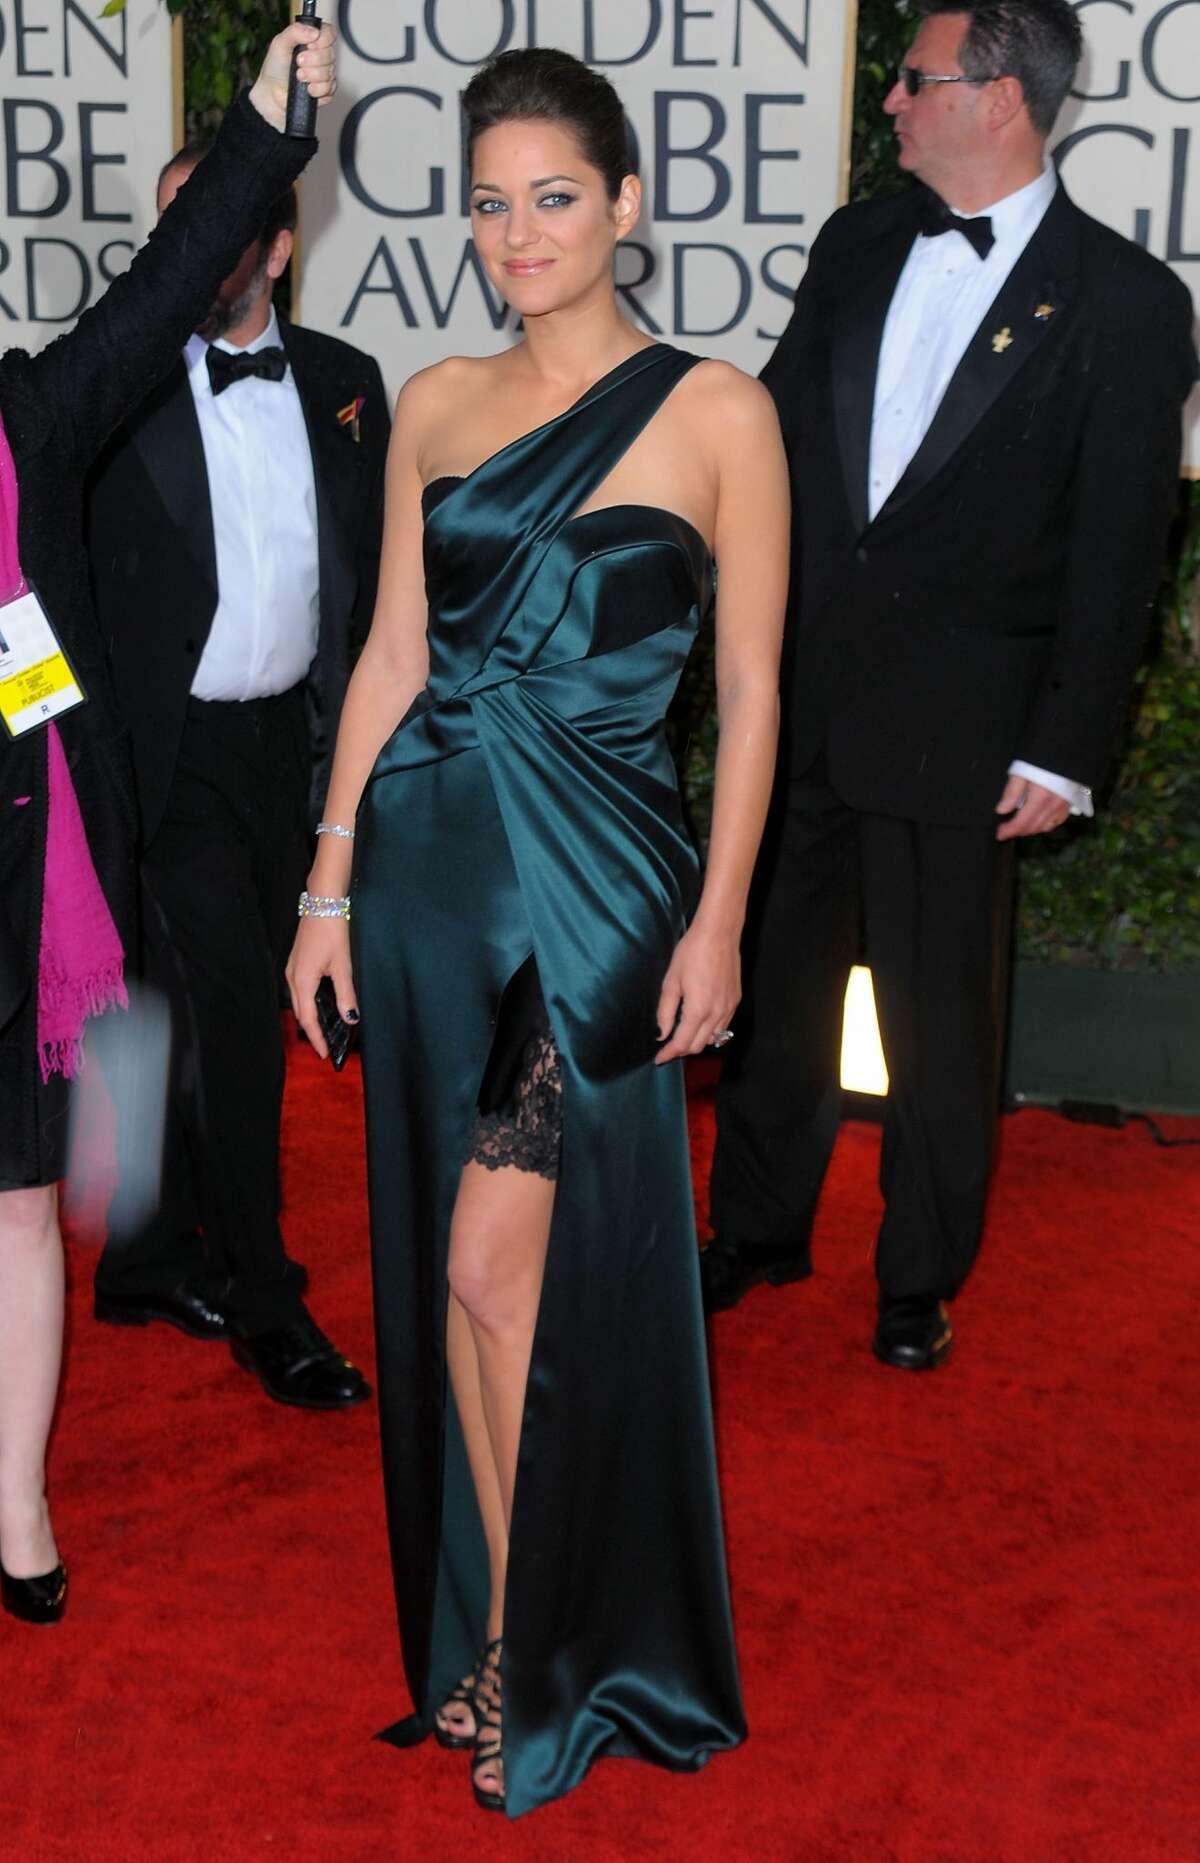 2010: Marion Cotillard in Christian Dior.